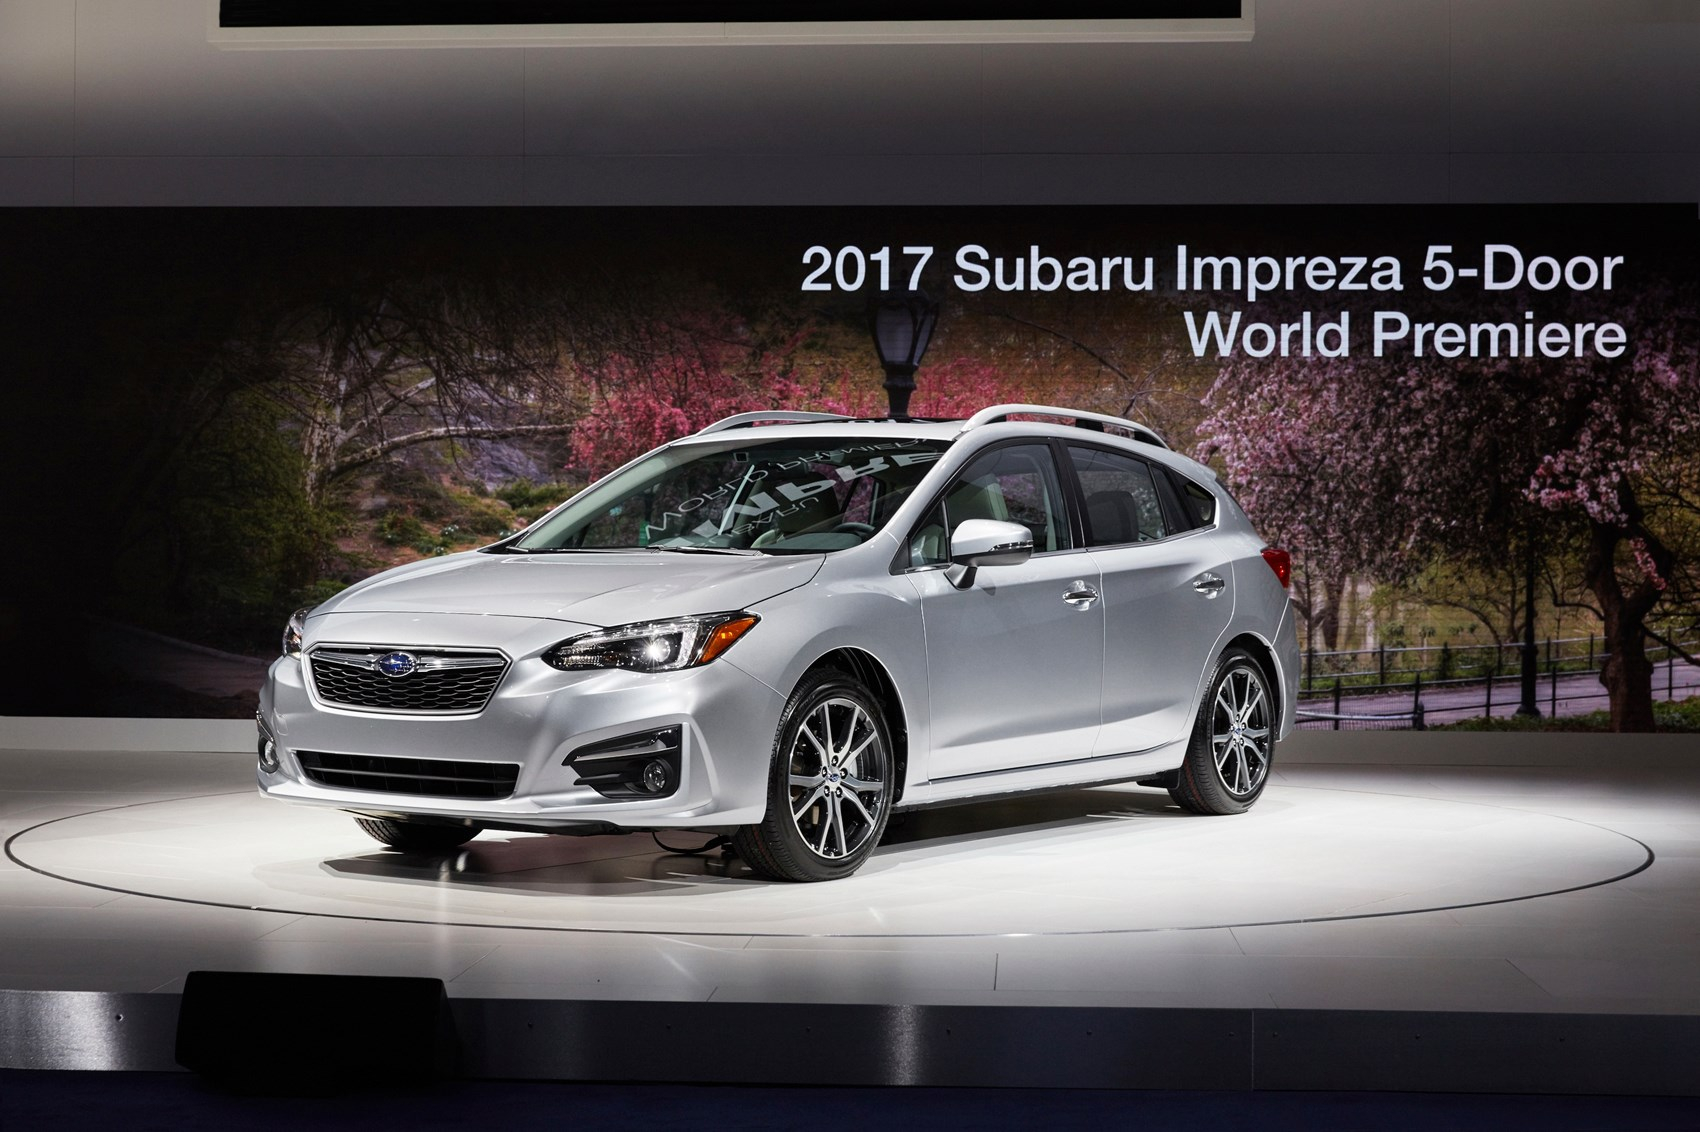 All new Subaru Impreza WRX and WRX STI versions in the works by